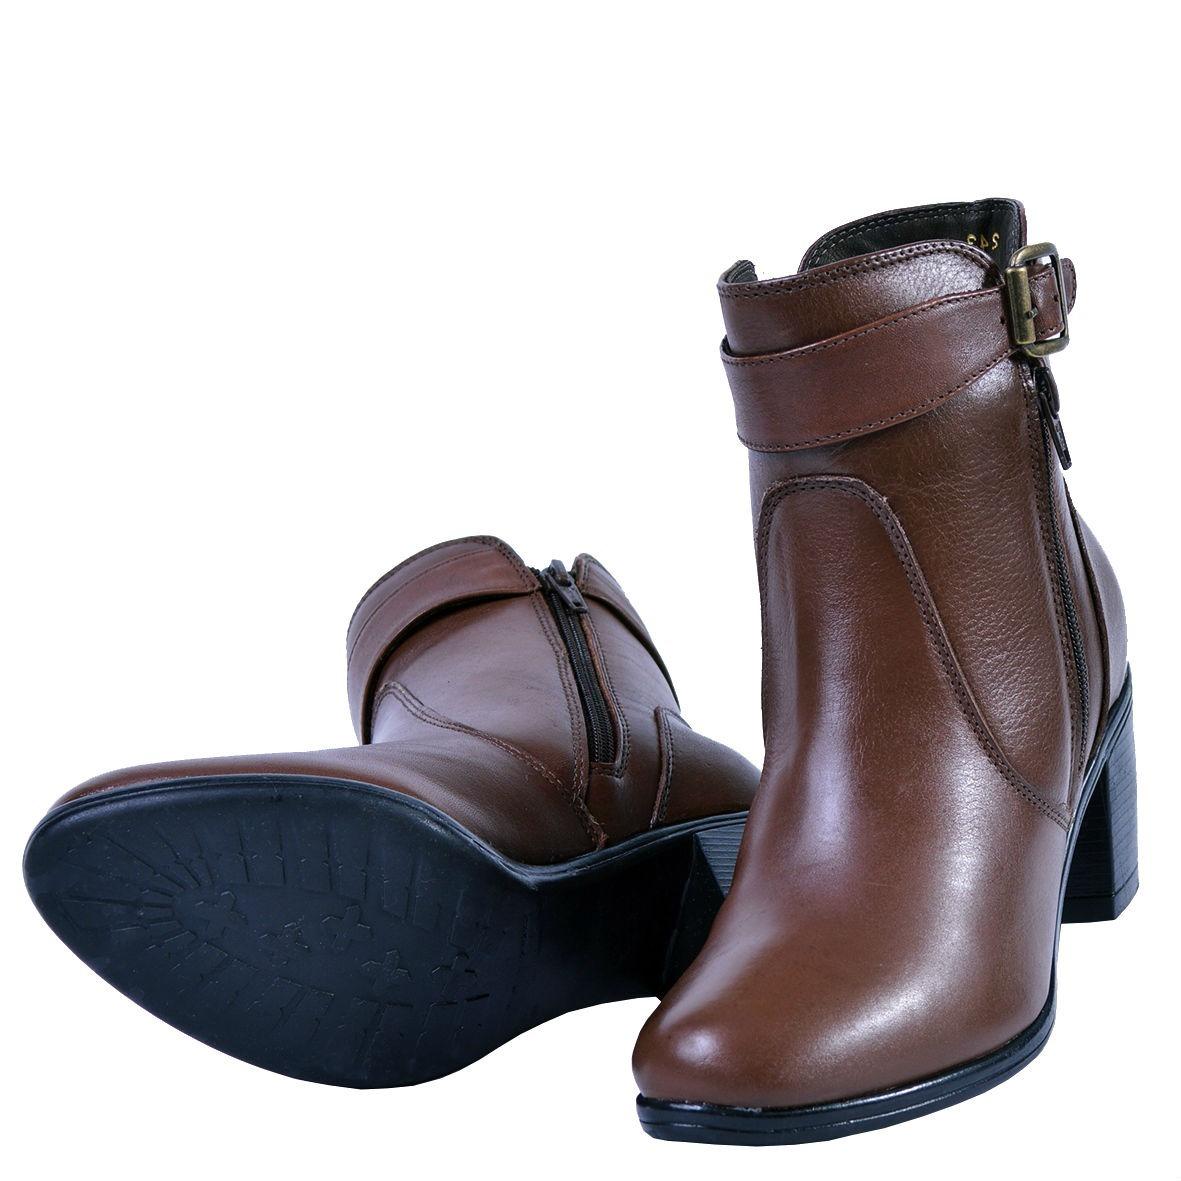 c934201a8 bota feminina cano curto! 100% couro! couro moda 243. Carregando zoom.